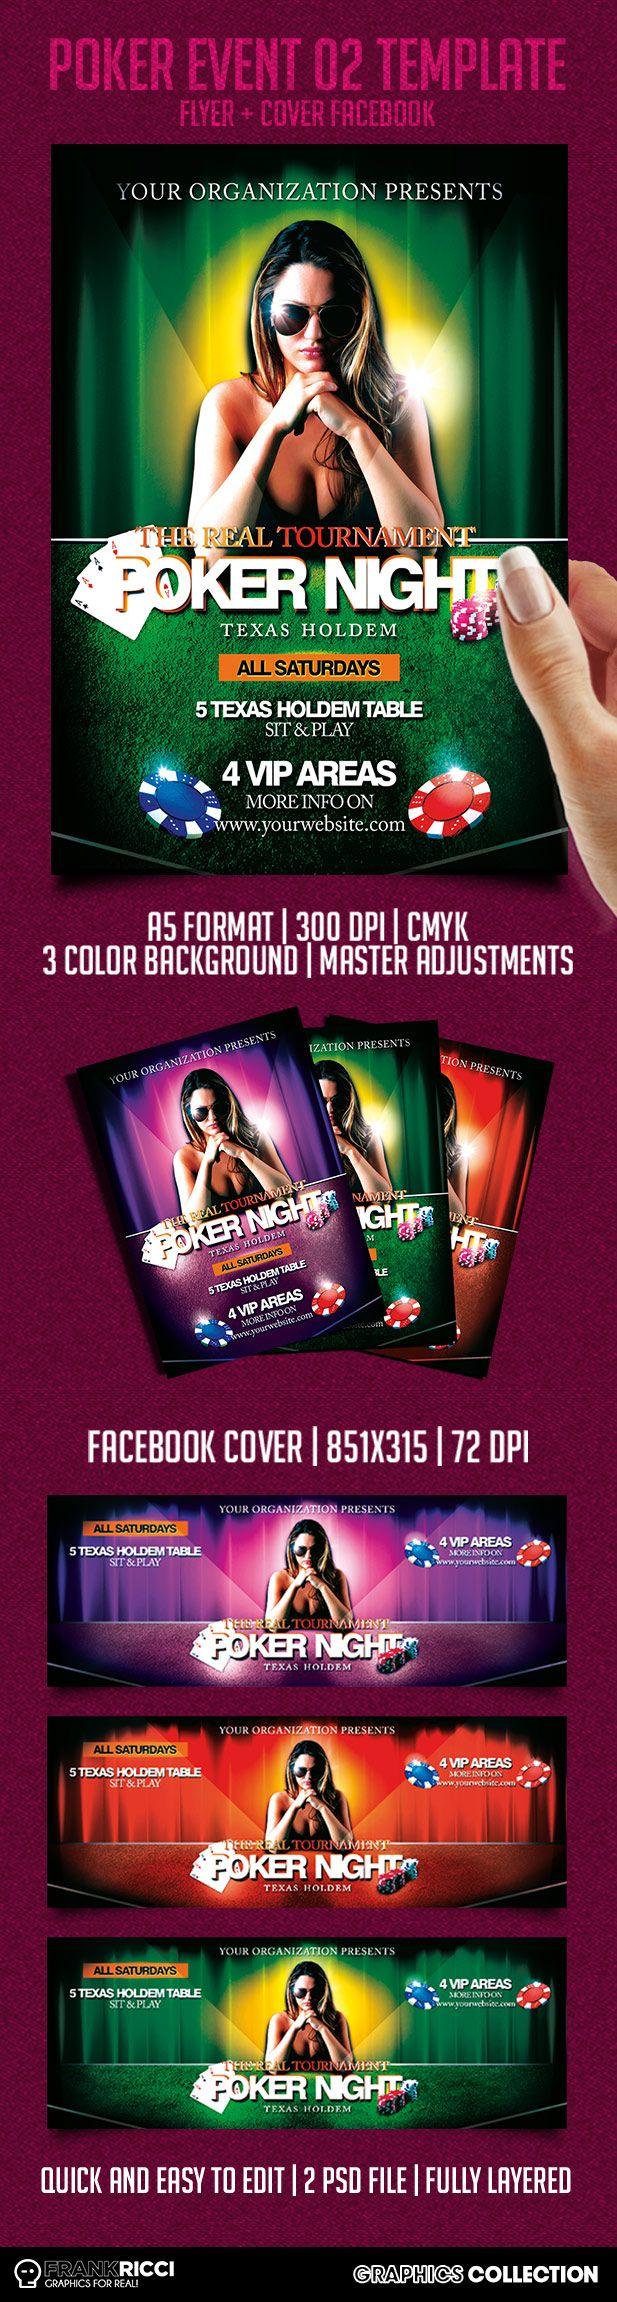 Poker 02 New PSD Template avalaible on http://frankricci.it/poker-02/